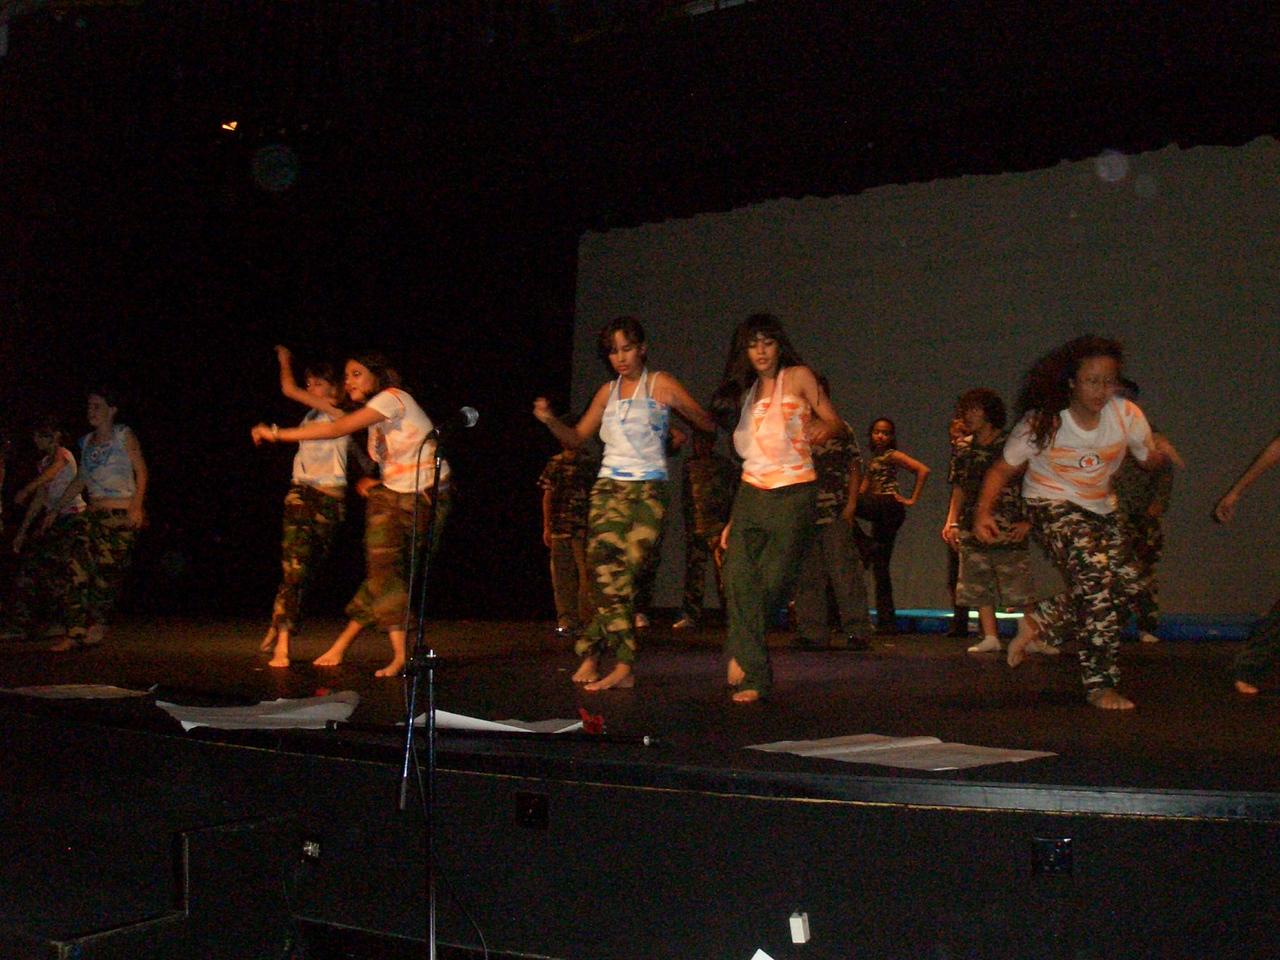 Naomi dancing on stage at the International School Kuala Lumpur(ISKL) Showcase Night